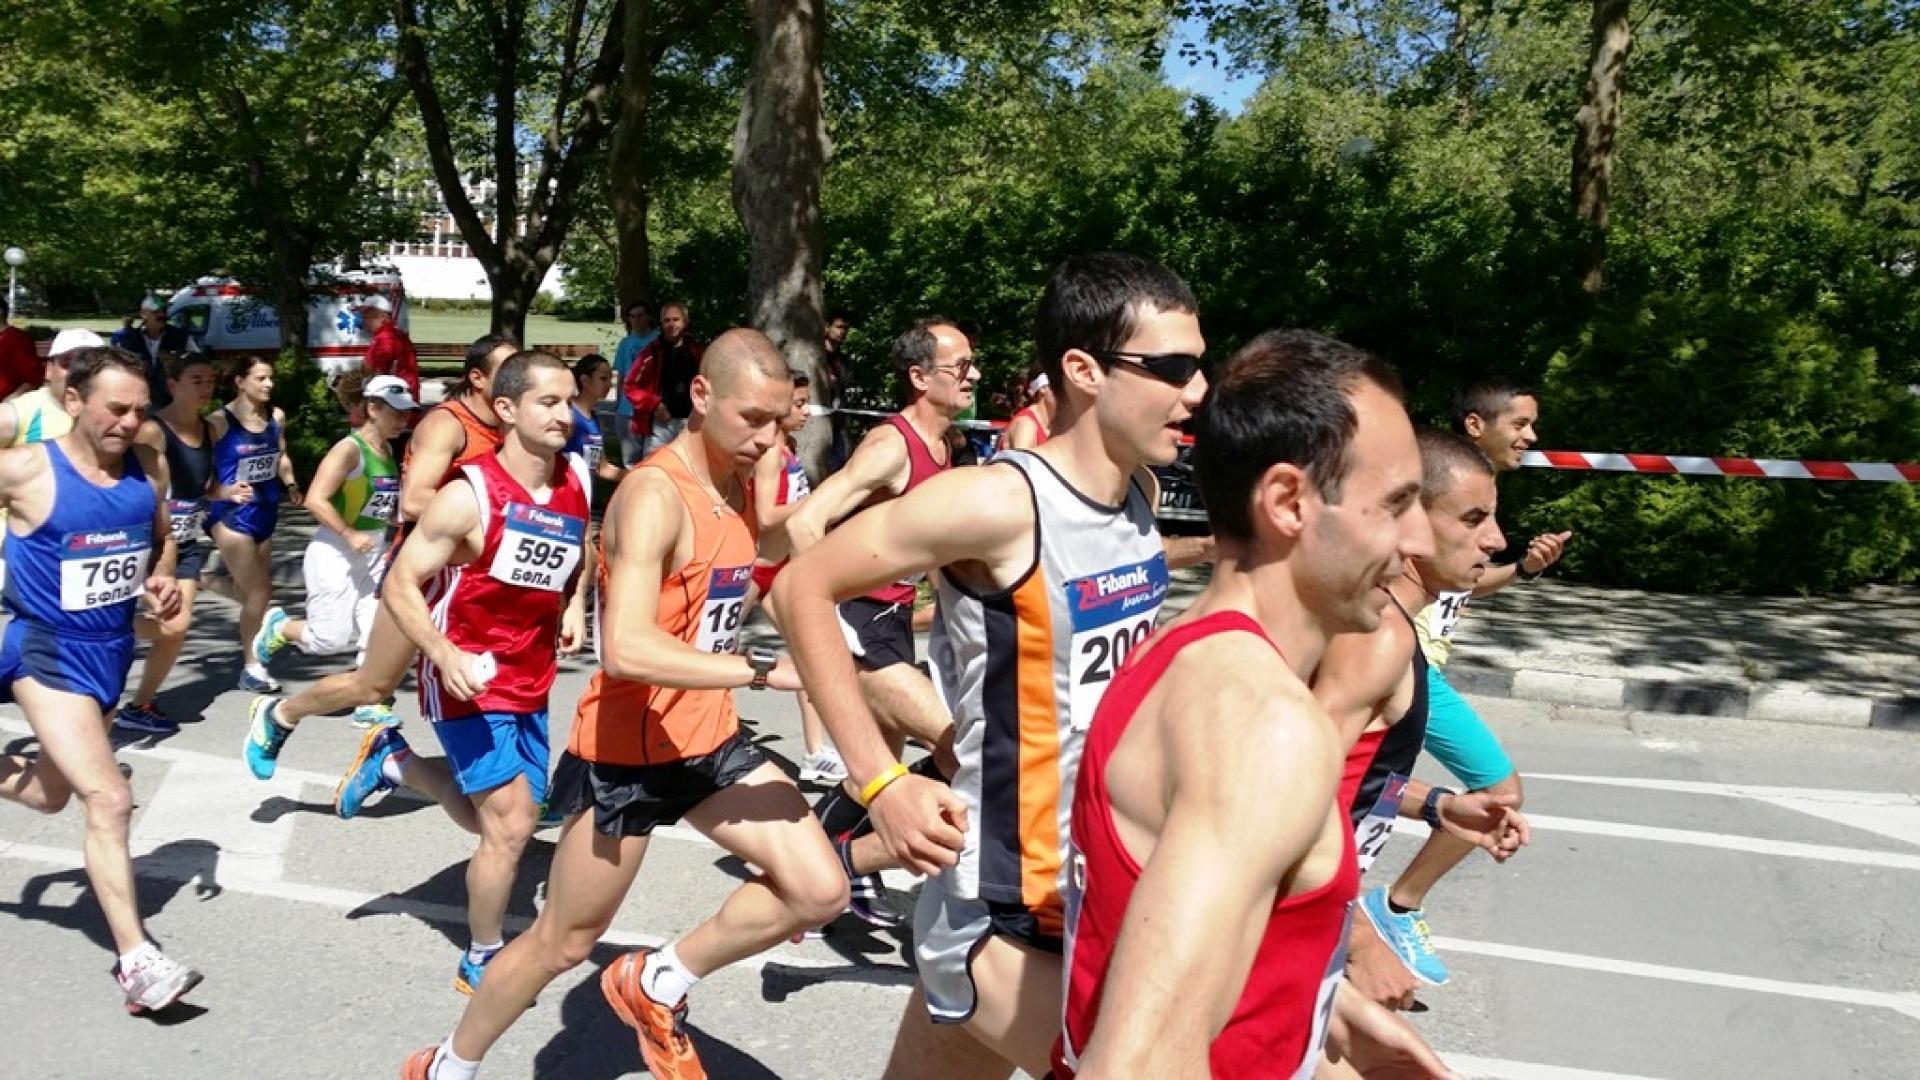 16 септември 2017 - Международен пробег Русе - Гюргево